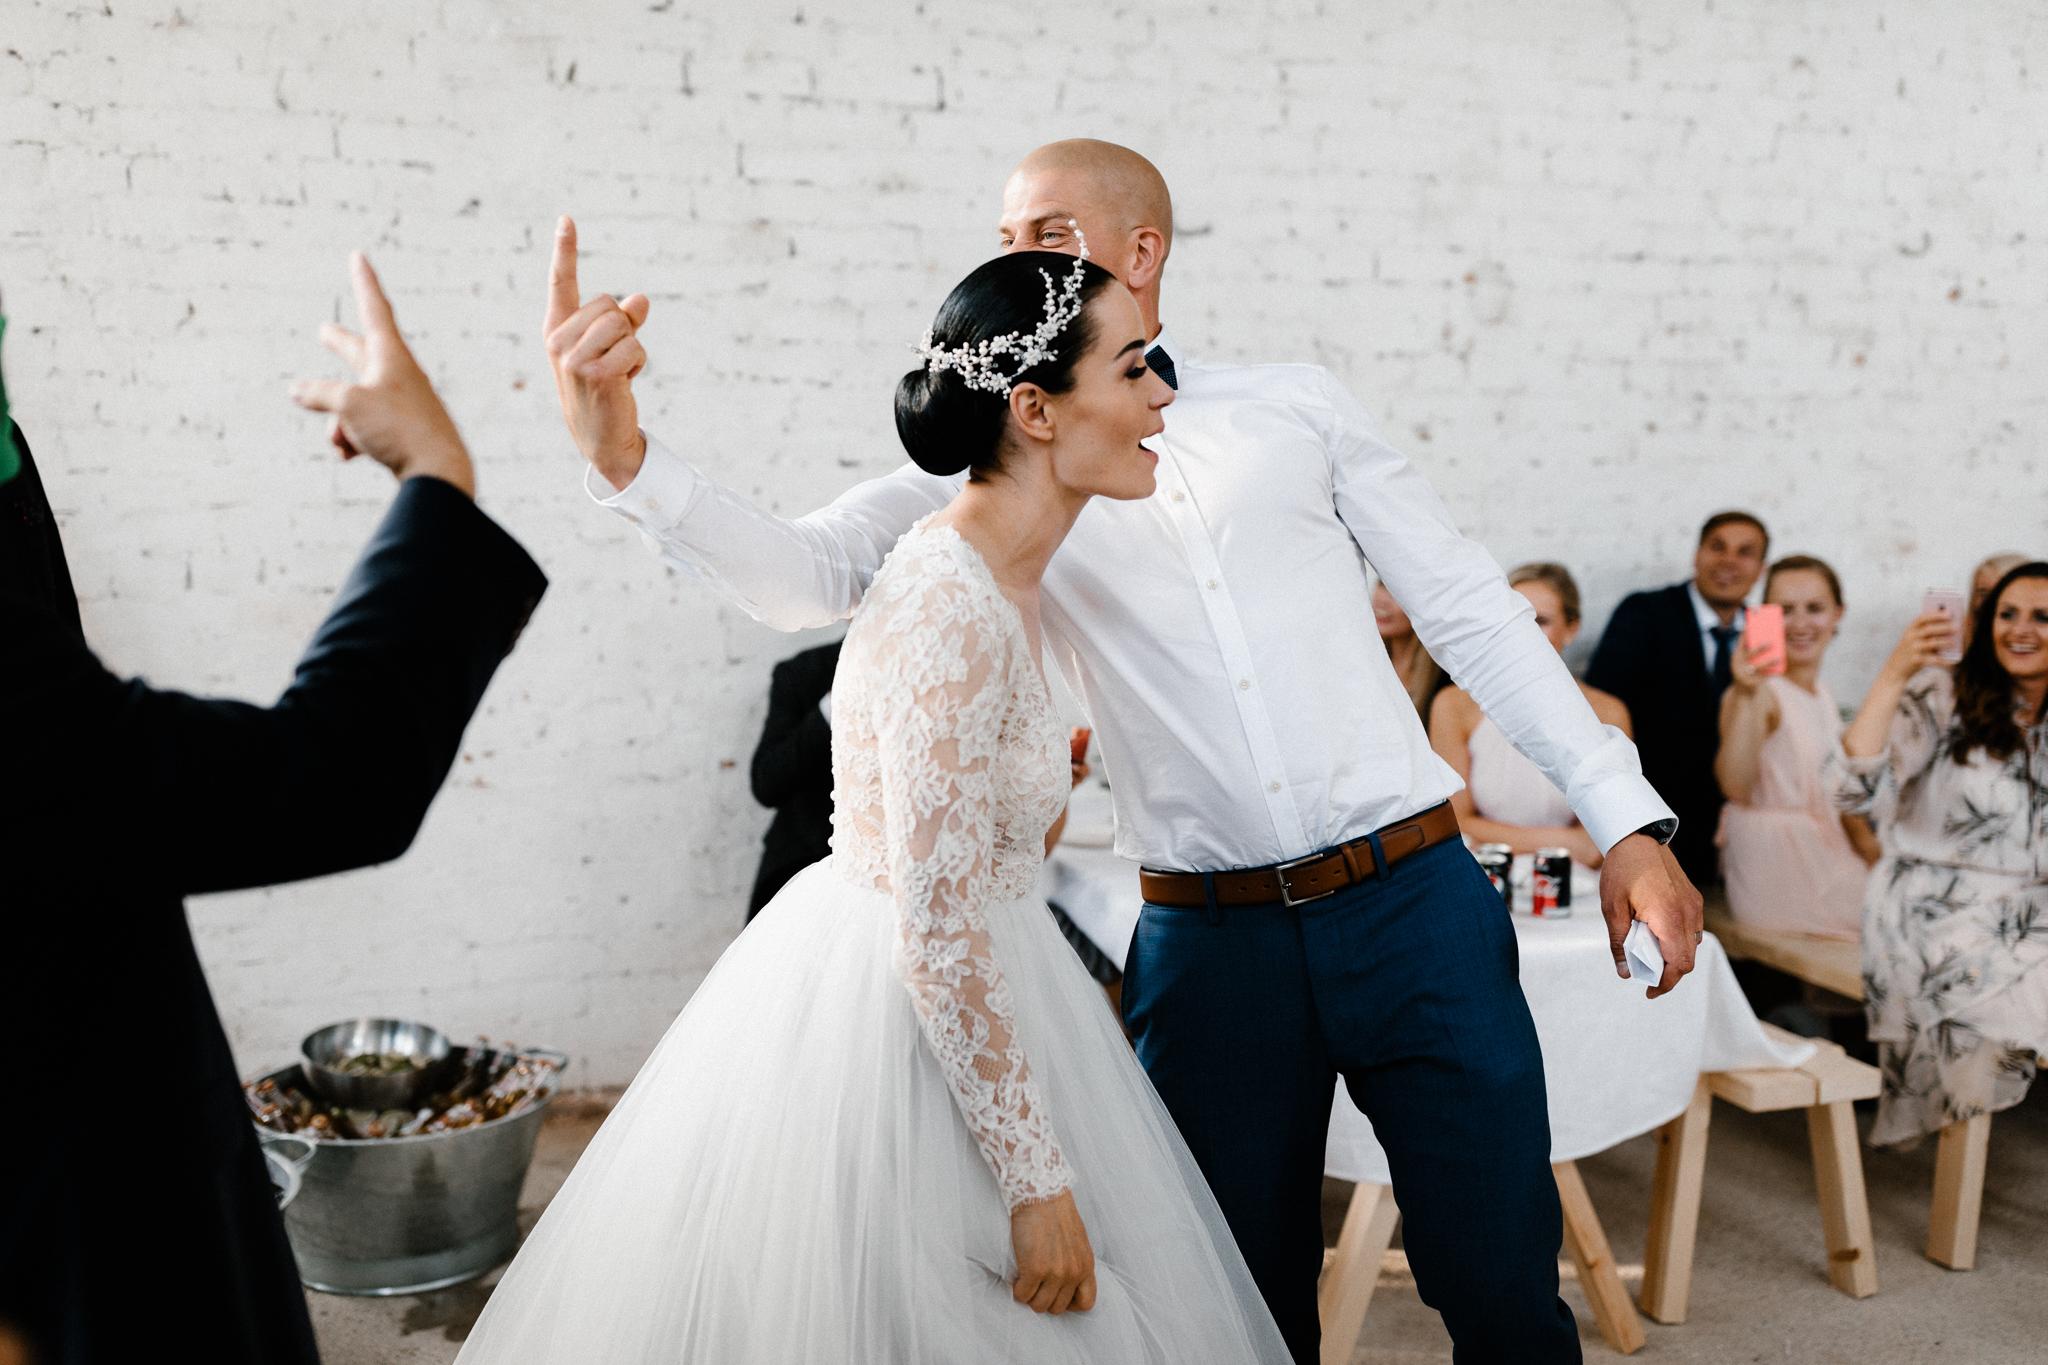 Essi + Ville   Oitbacka Gården   by Patrick Karkkolainen Wedding Photography-282.jpg